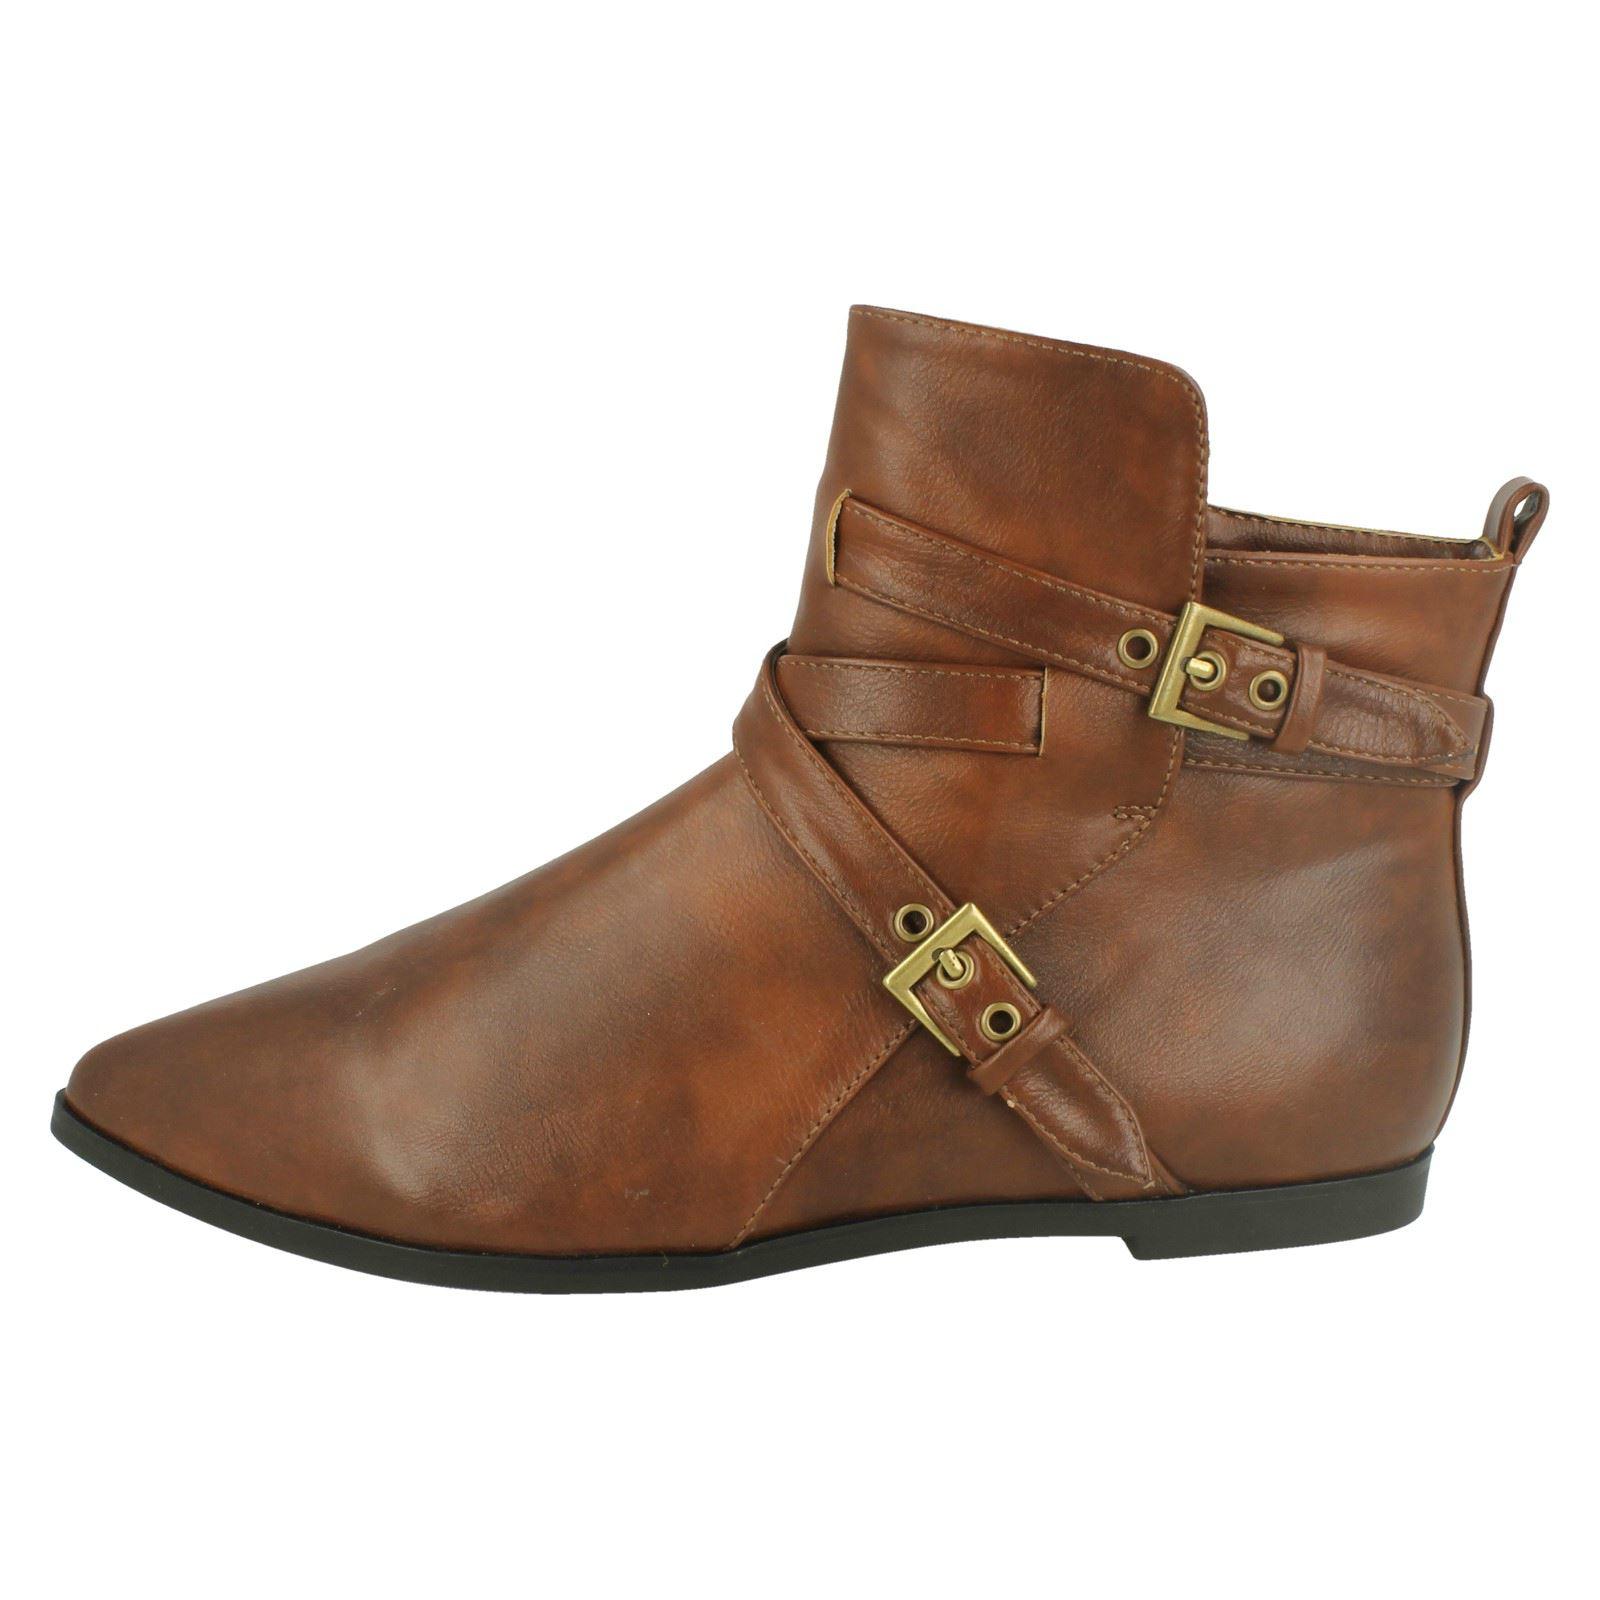 Ladies Spot On Pixie Boots